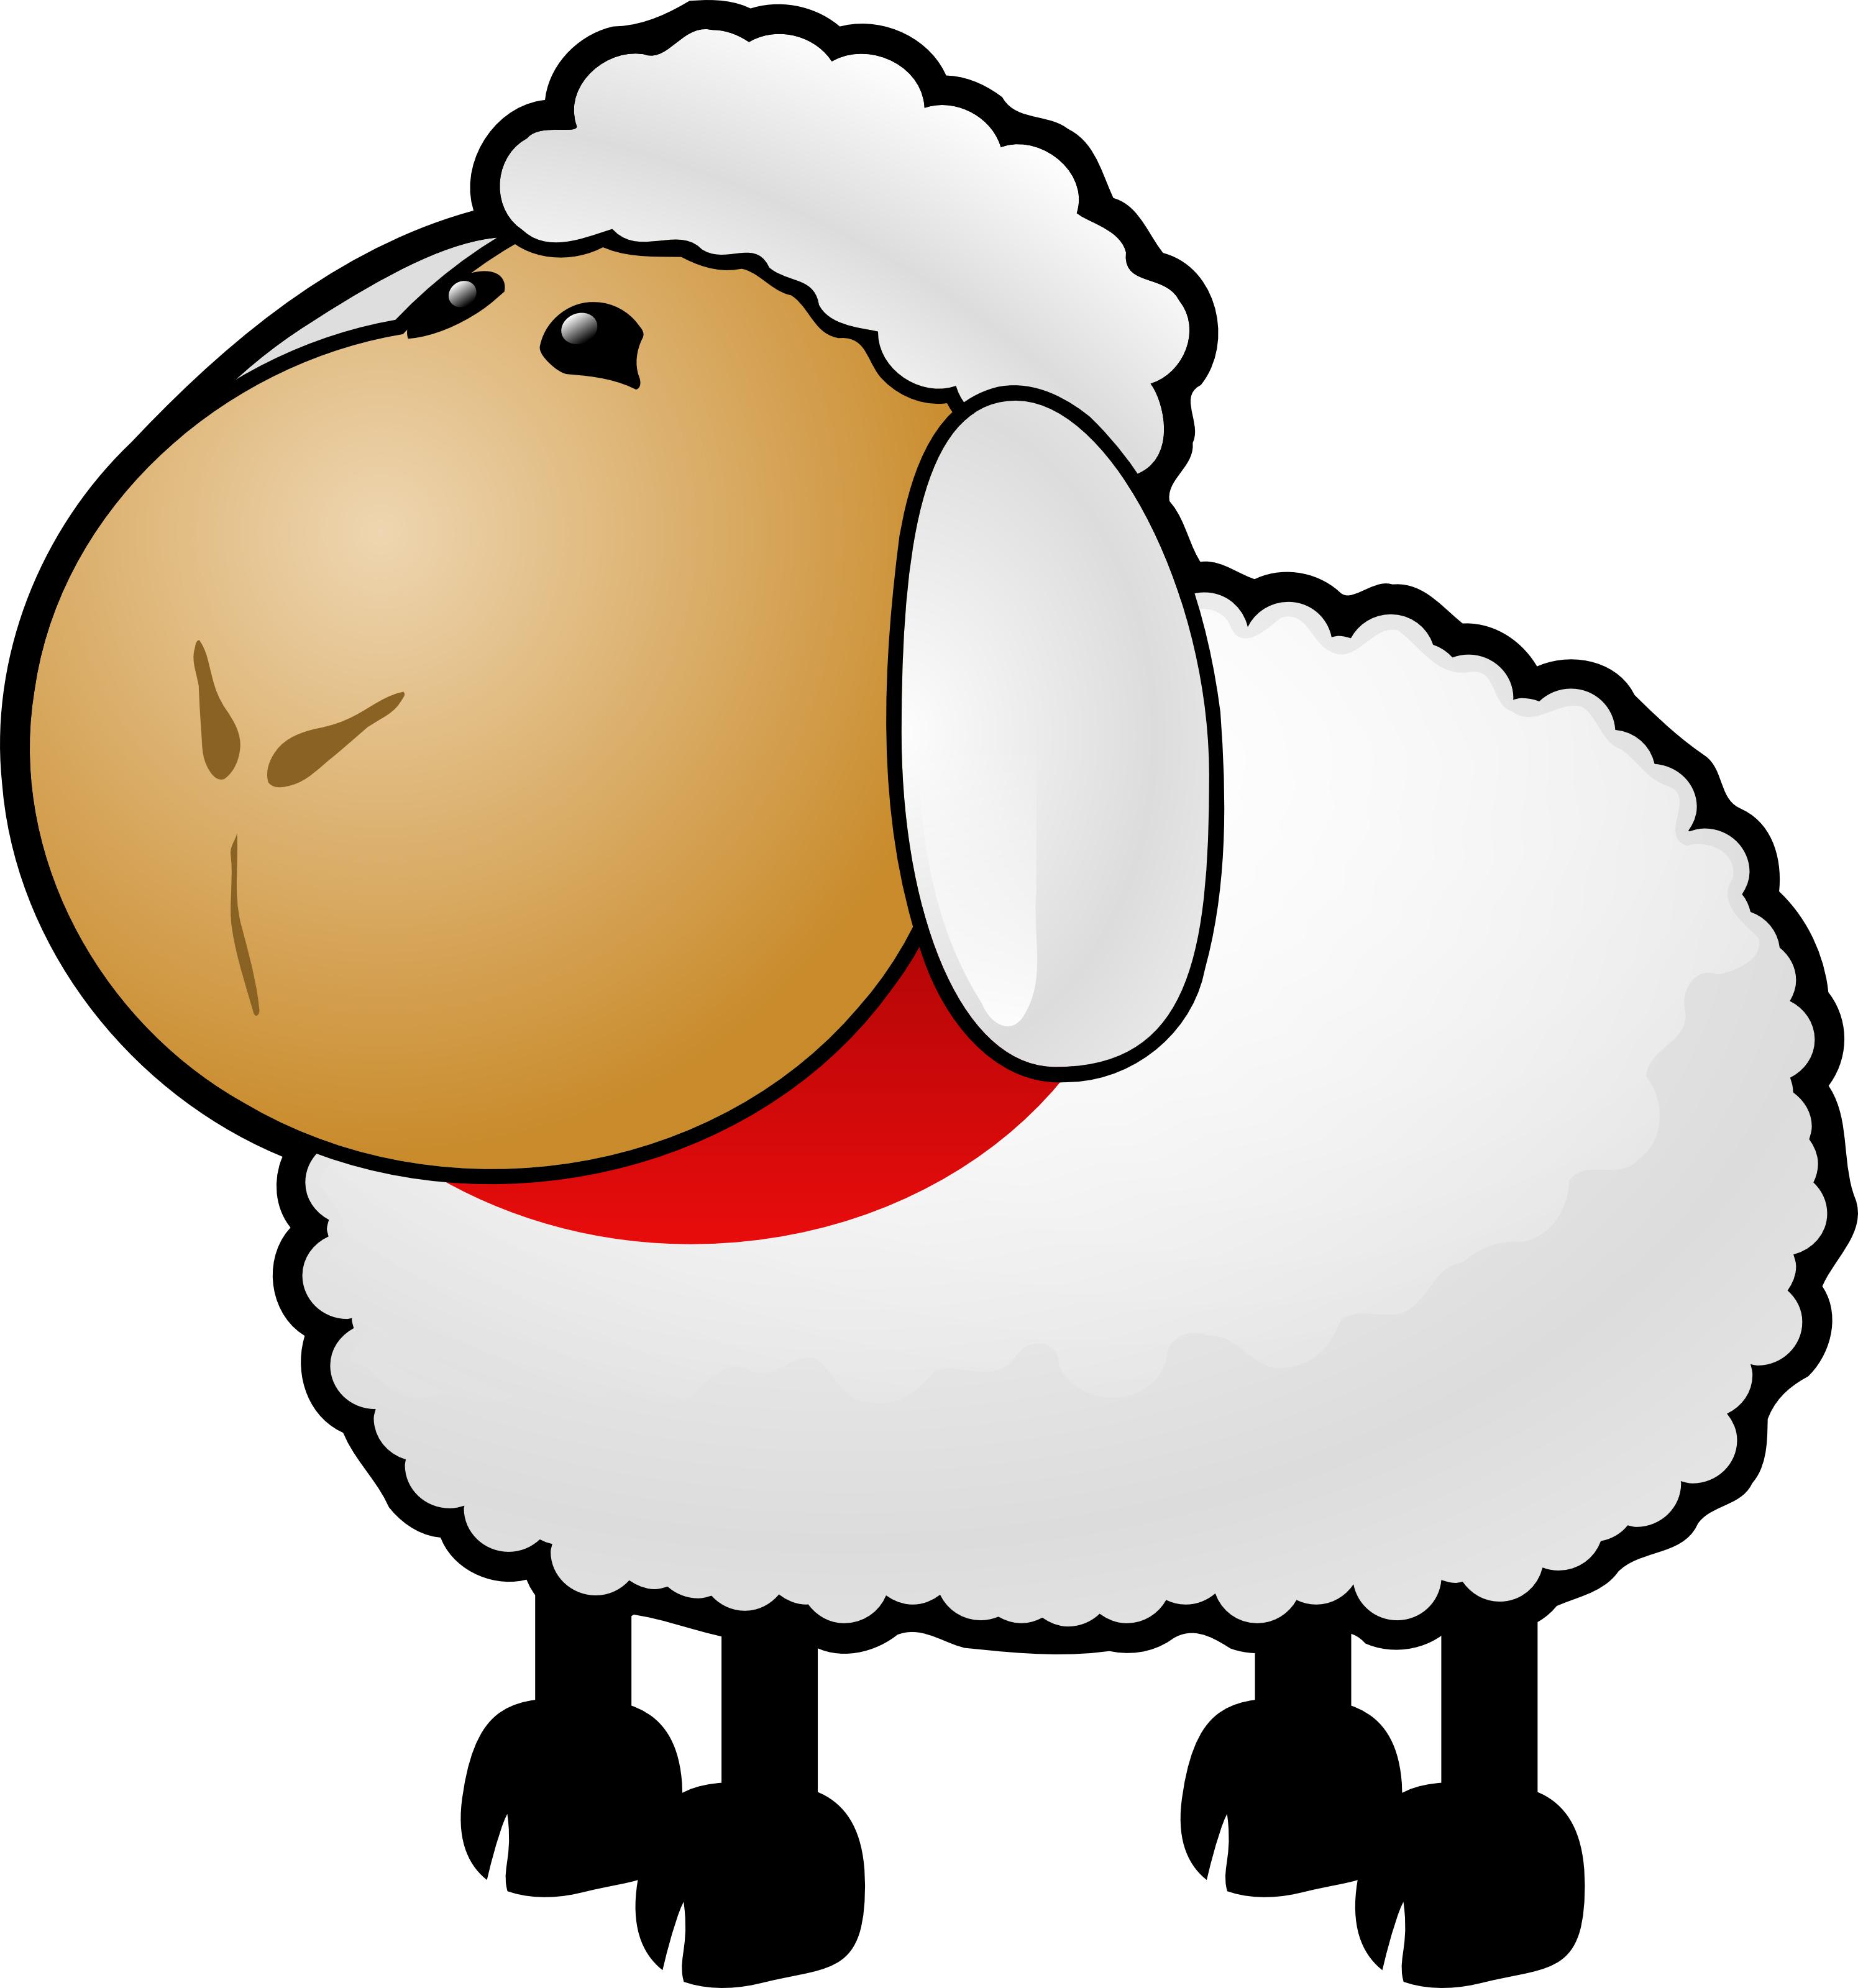 2990x3200 Free Cartoon Sheep Clipart Illustration